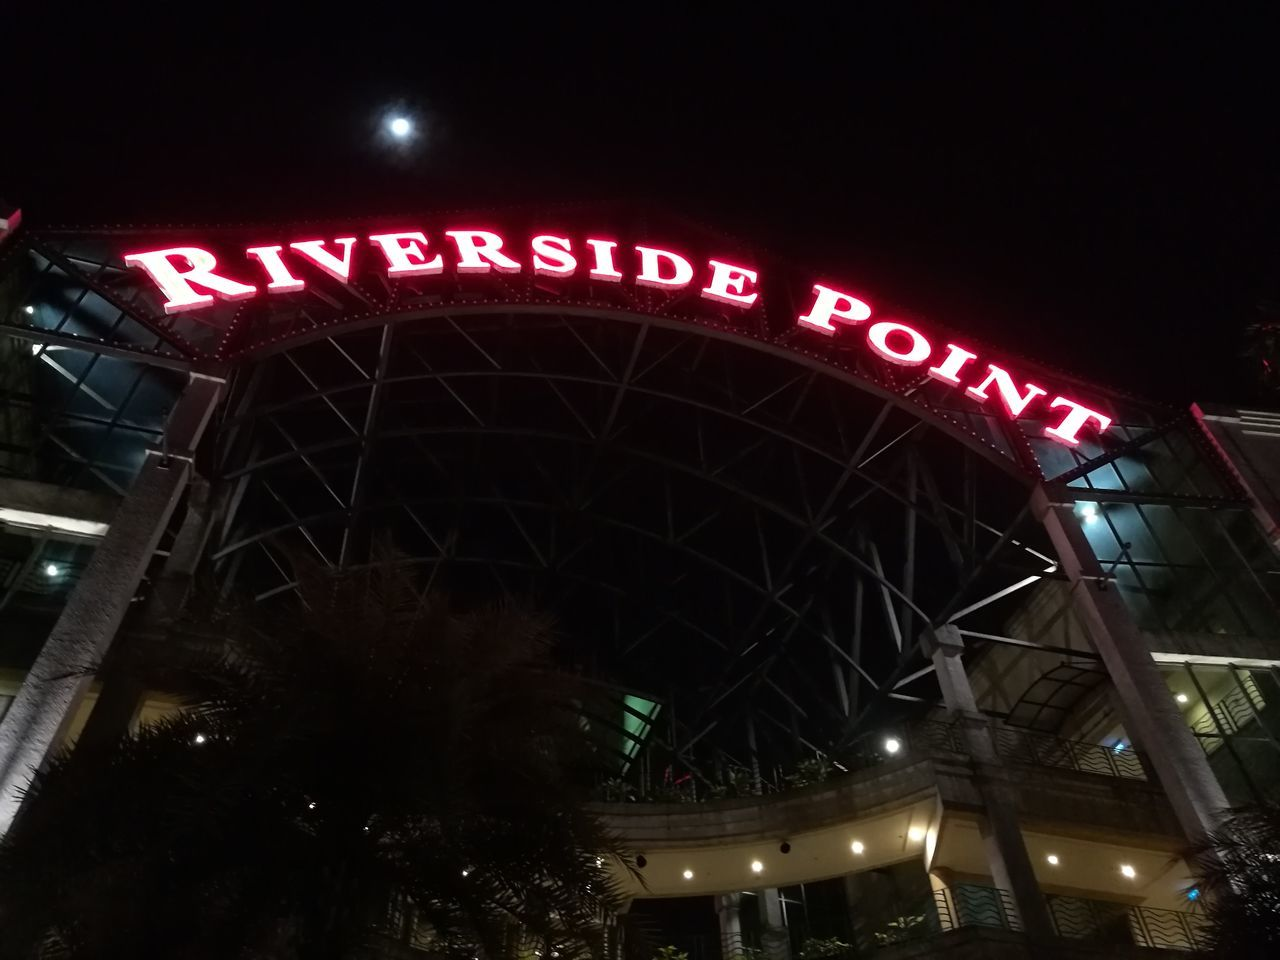 Riverfront Sigapore Night Lighting Equipment Neon Outdoors City